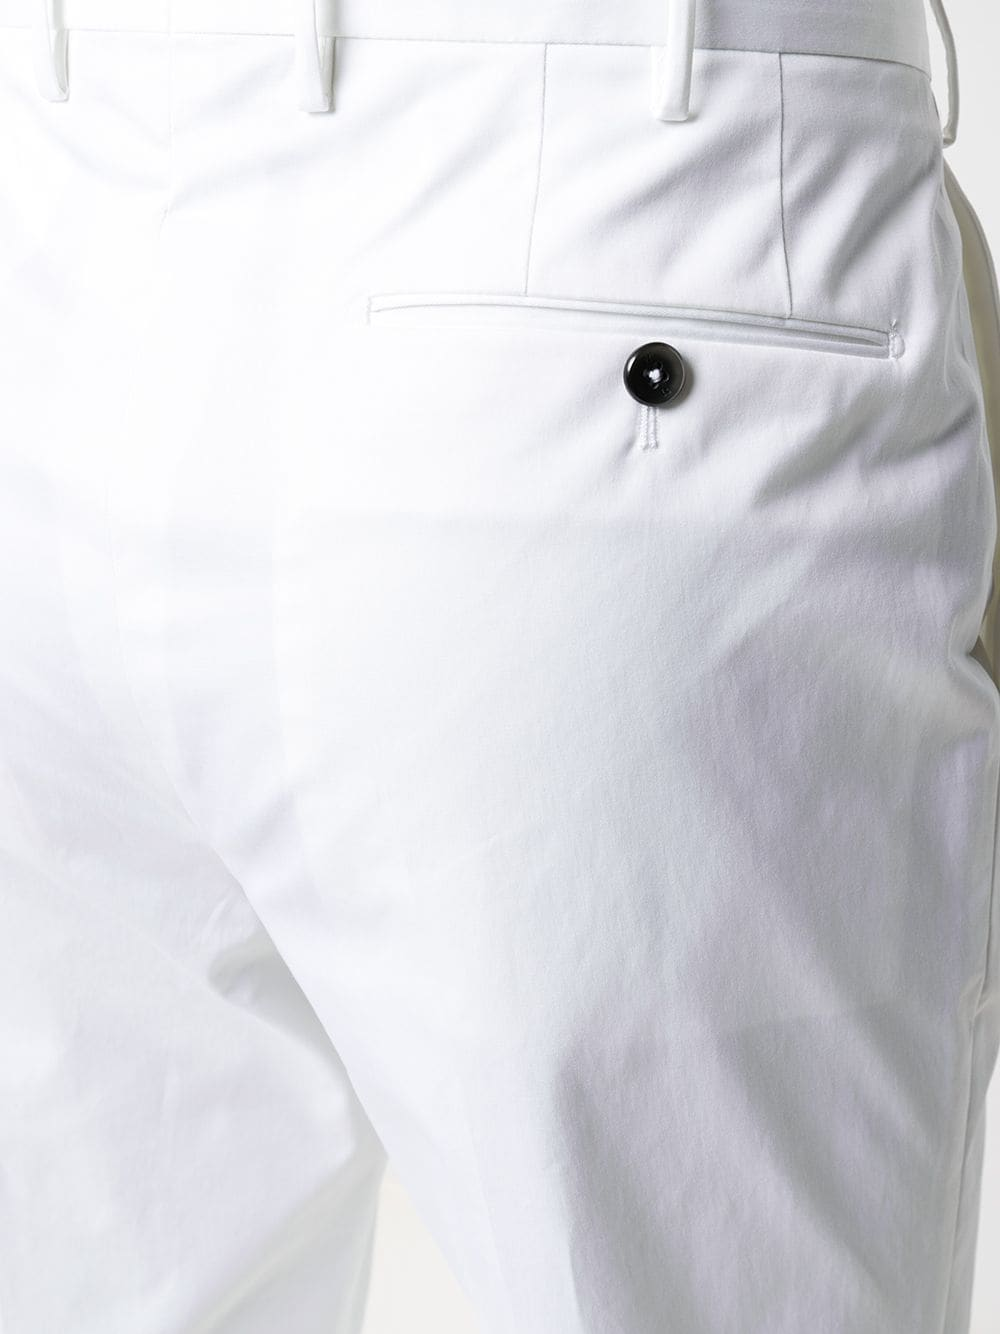 Pantaloni sartoriali a gamba dritta in cotone stretch bianco PT01 | Pantaloni | COASFKZ00CL1-MP270010